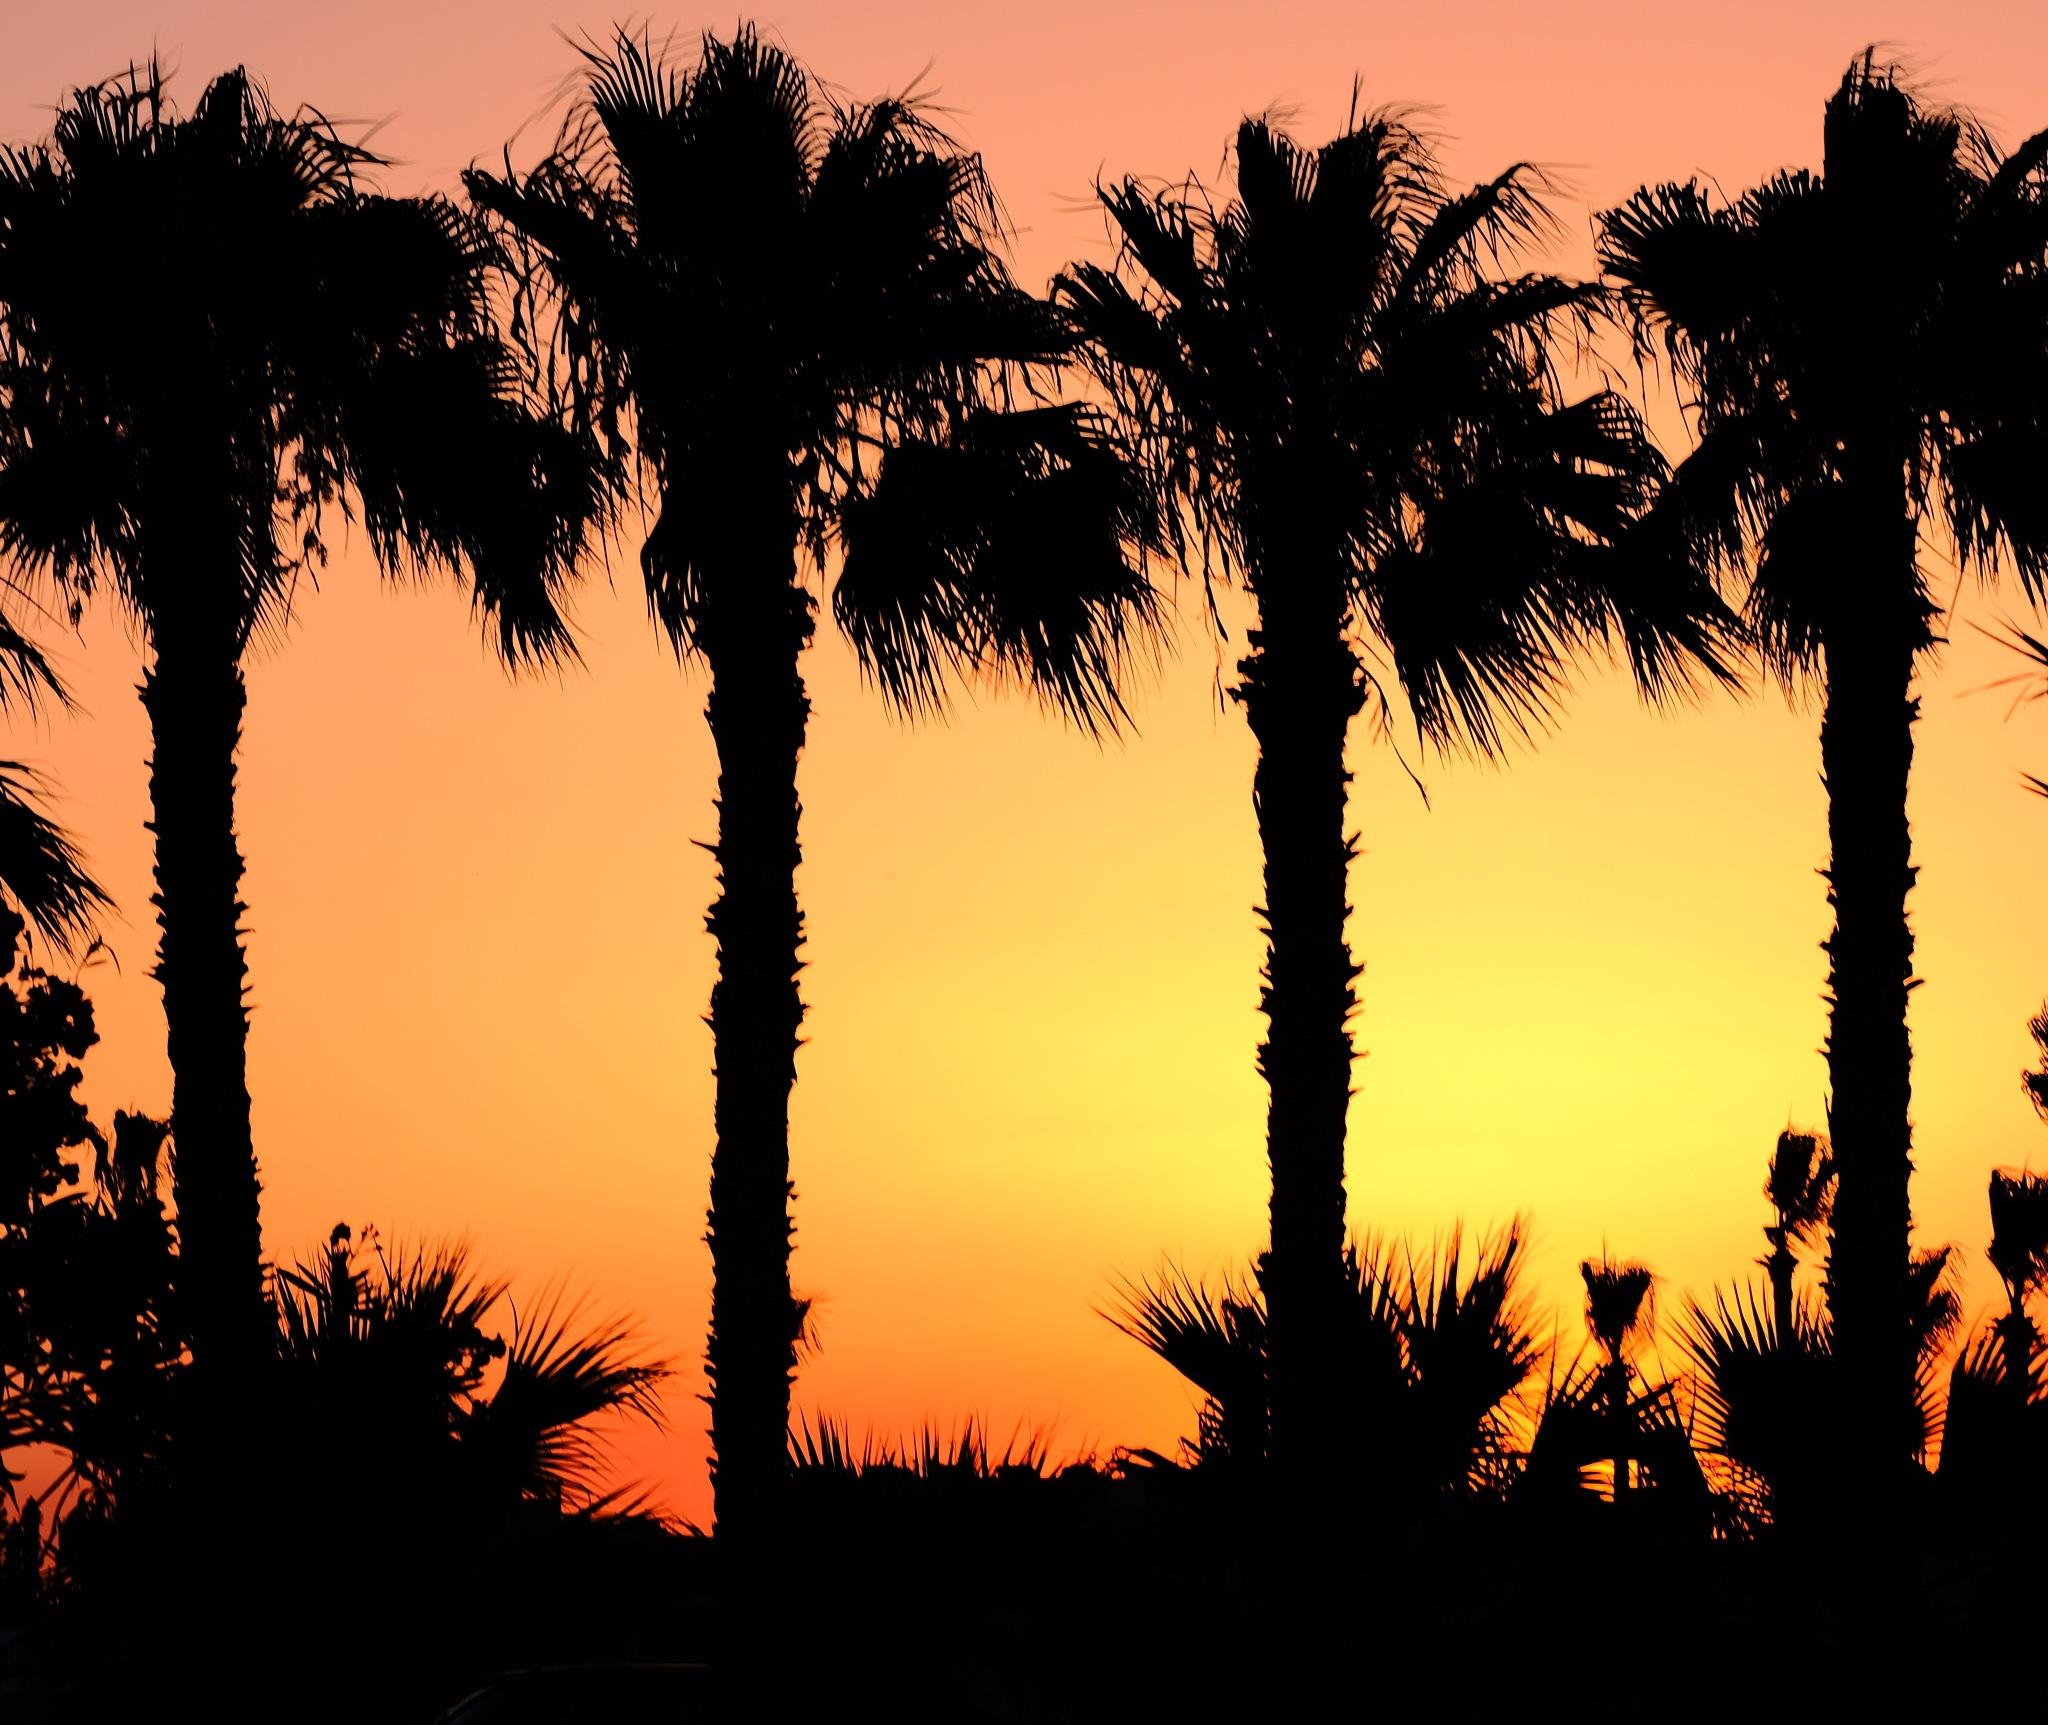 Burning sunset  by Rededia